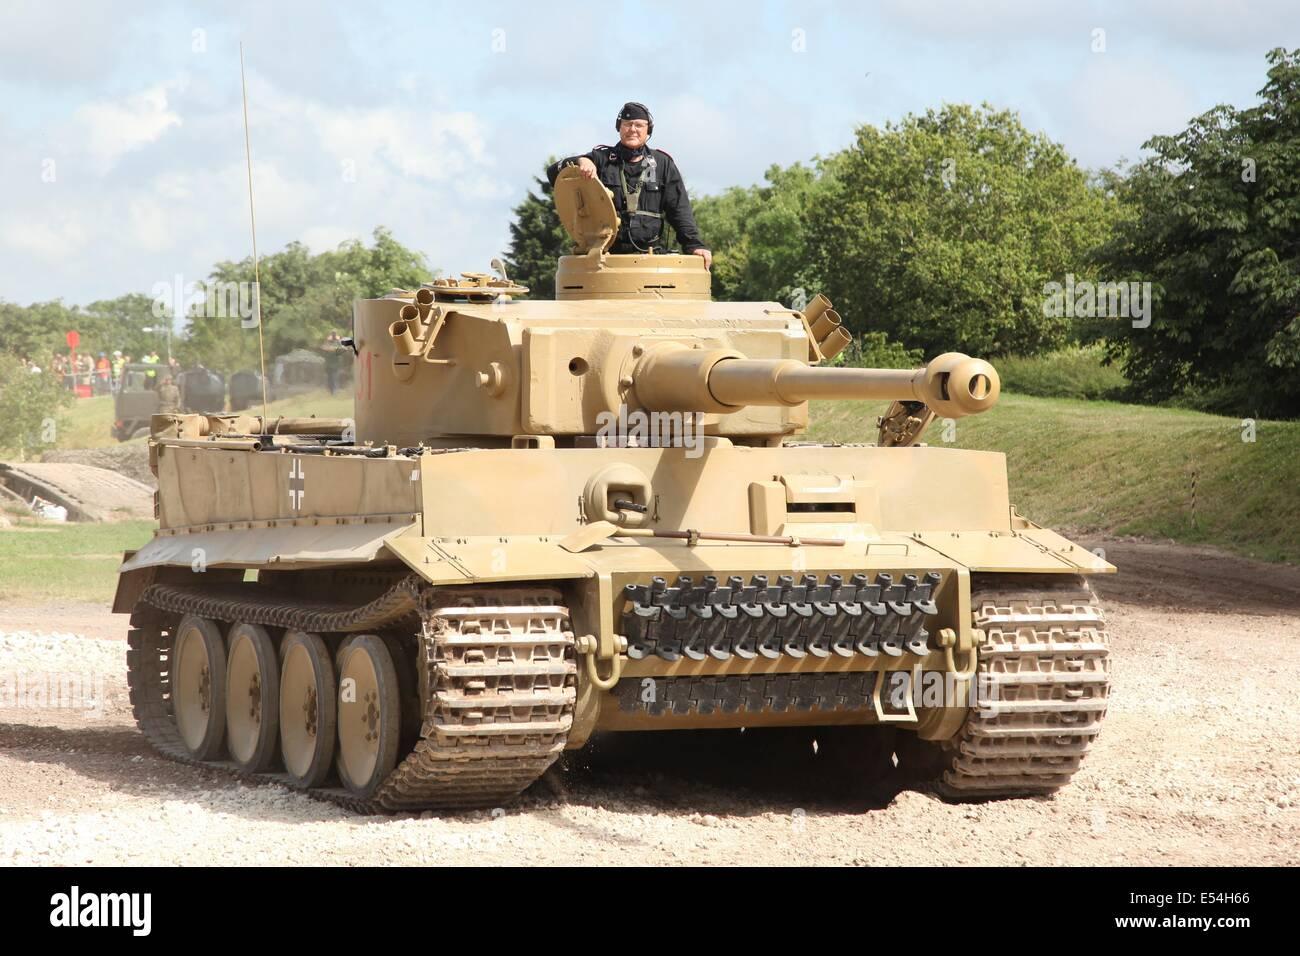 german vi tiger tank stock photos german vi tiger tank. Black Bedroom Furniture Sets. Home Design Ideas